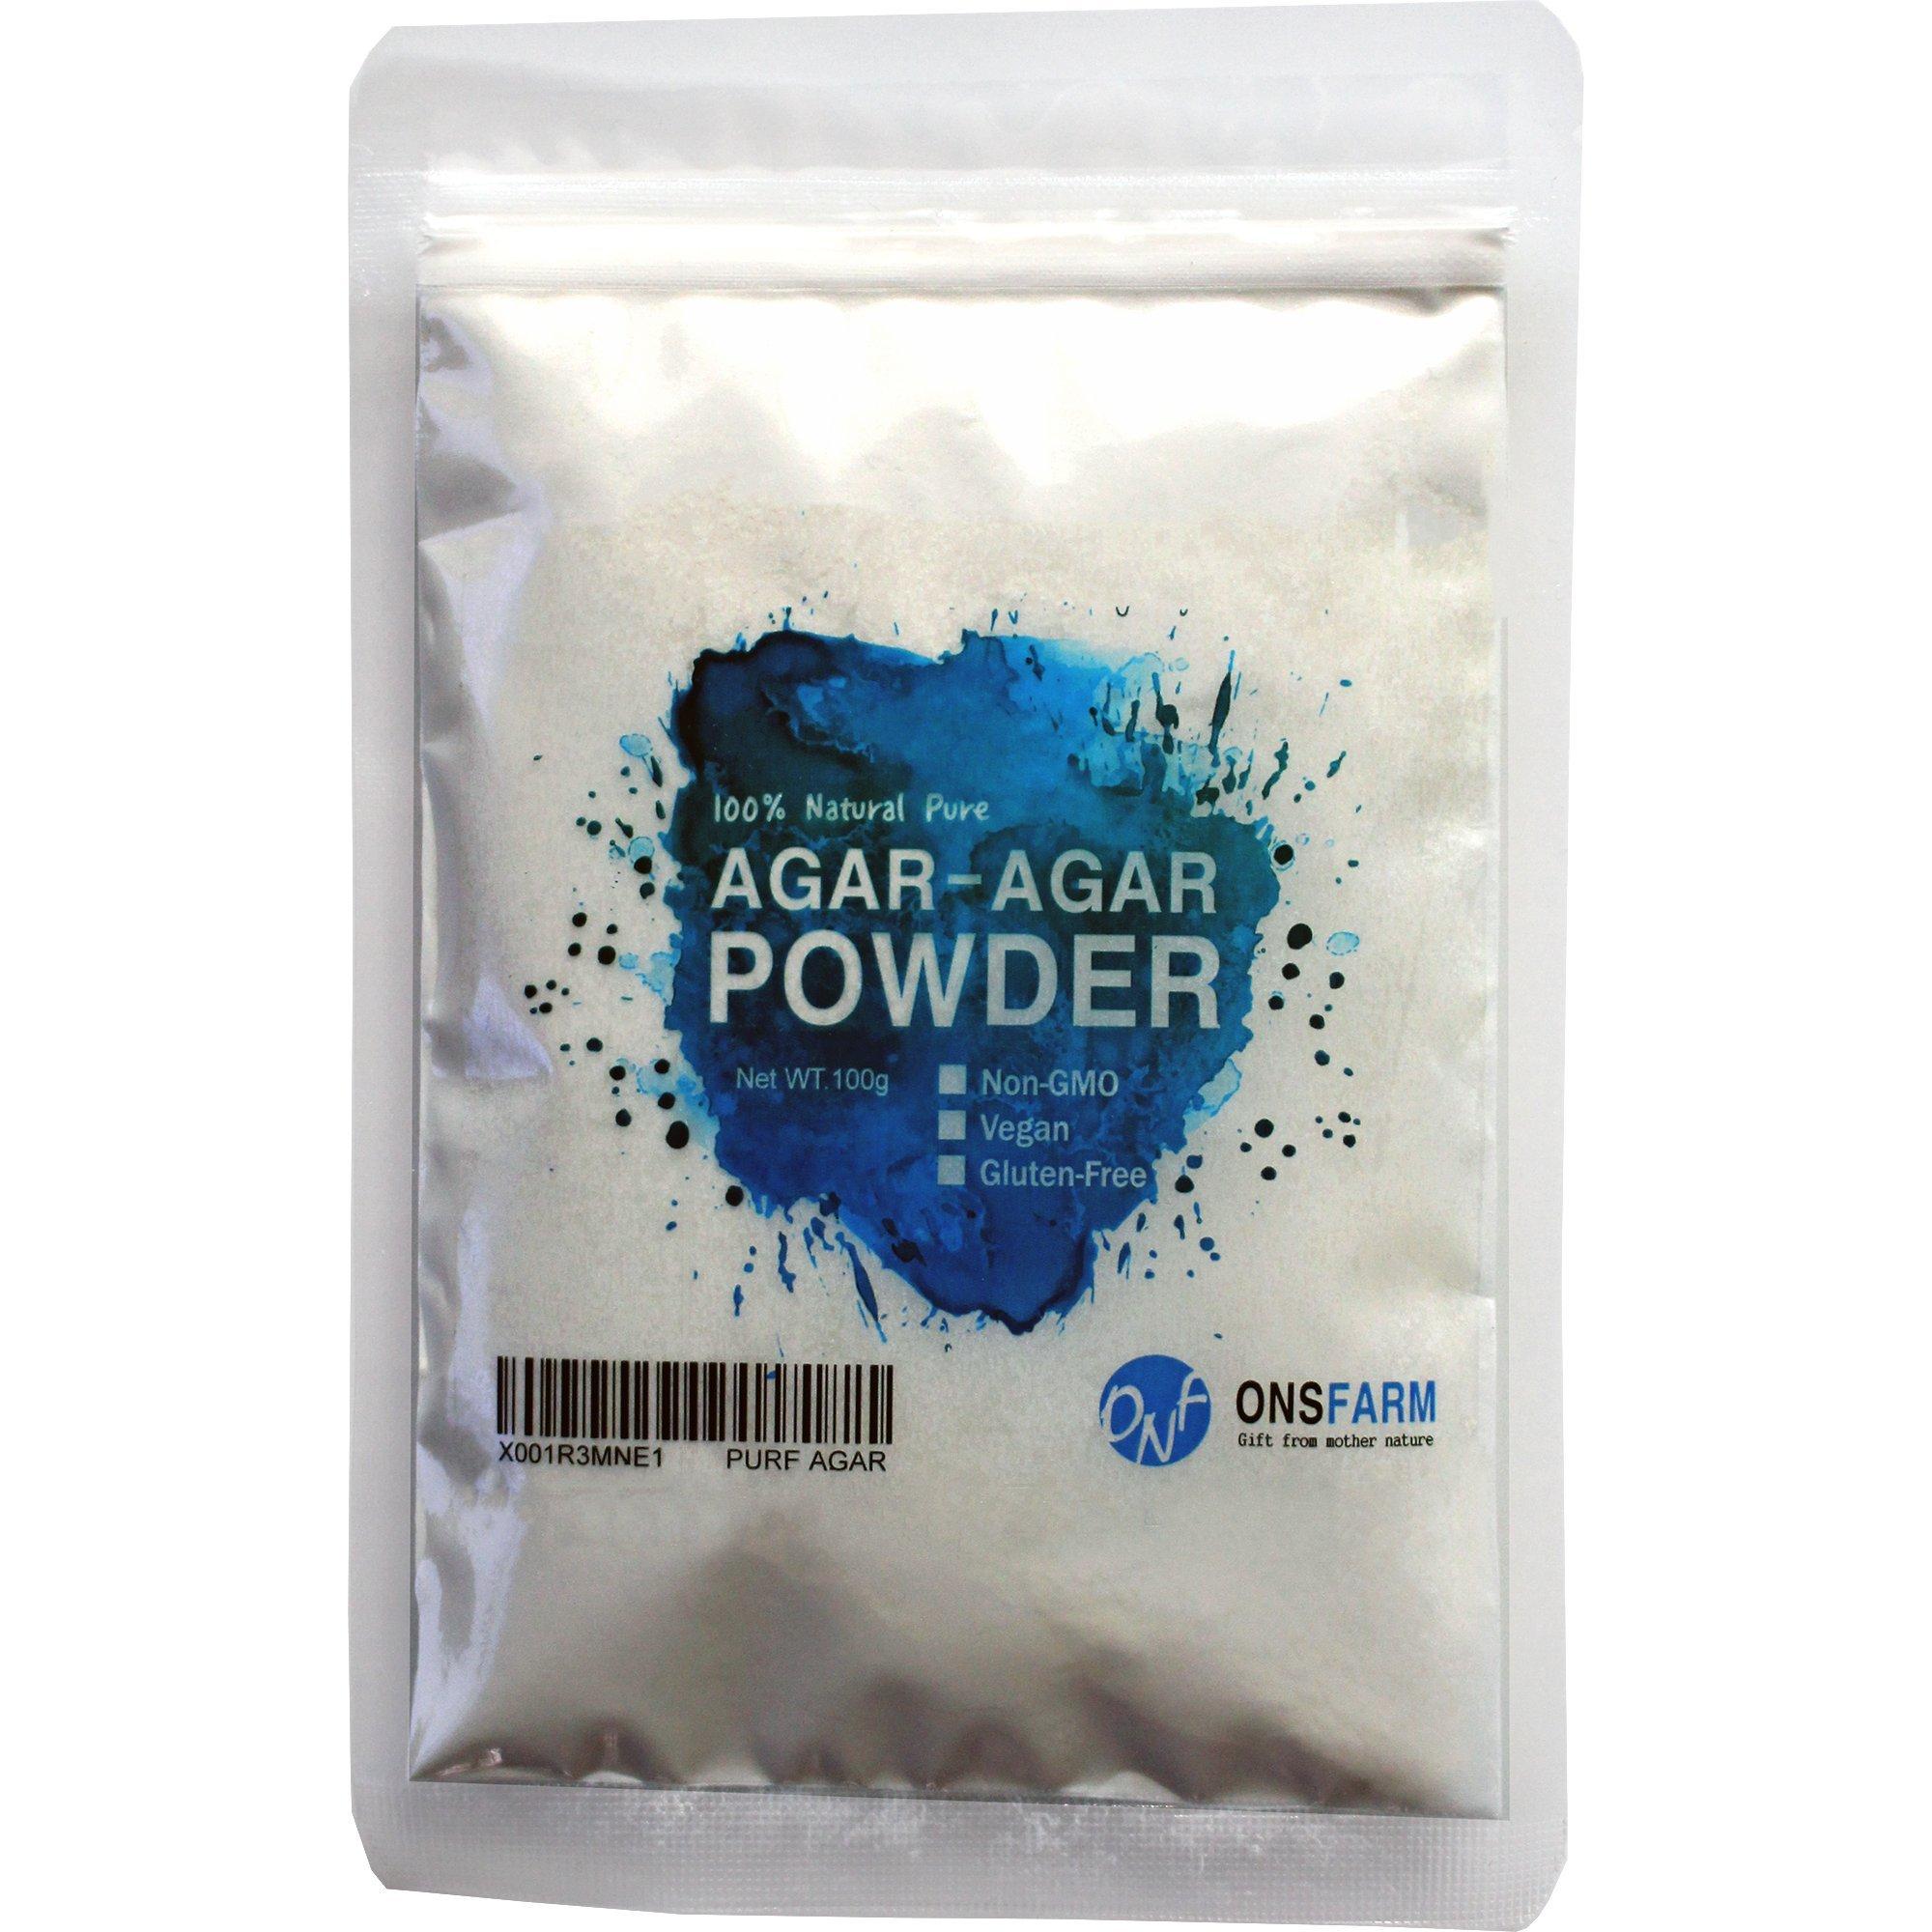 ONSFARM Agar Agar Pure Powder 3.53oz (100g) - Weight Loss and Vegan Gelatine Dietary Fiber Supplement Unflavored and Odorless Agar Powder Alternative Animal Gelatin for Vegiterian and Vegans